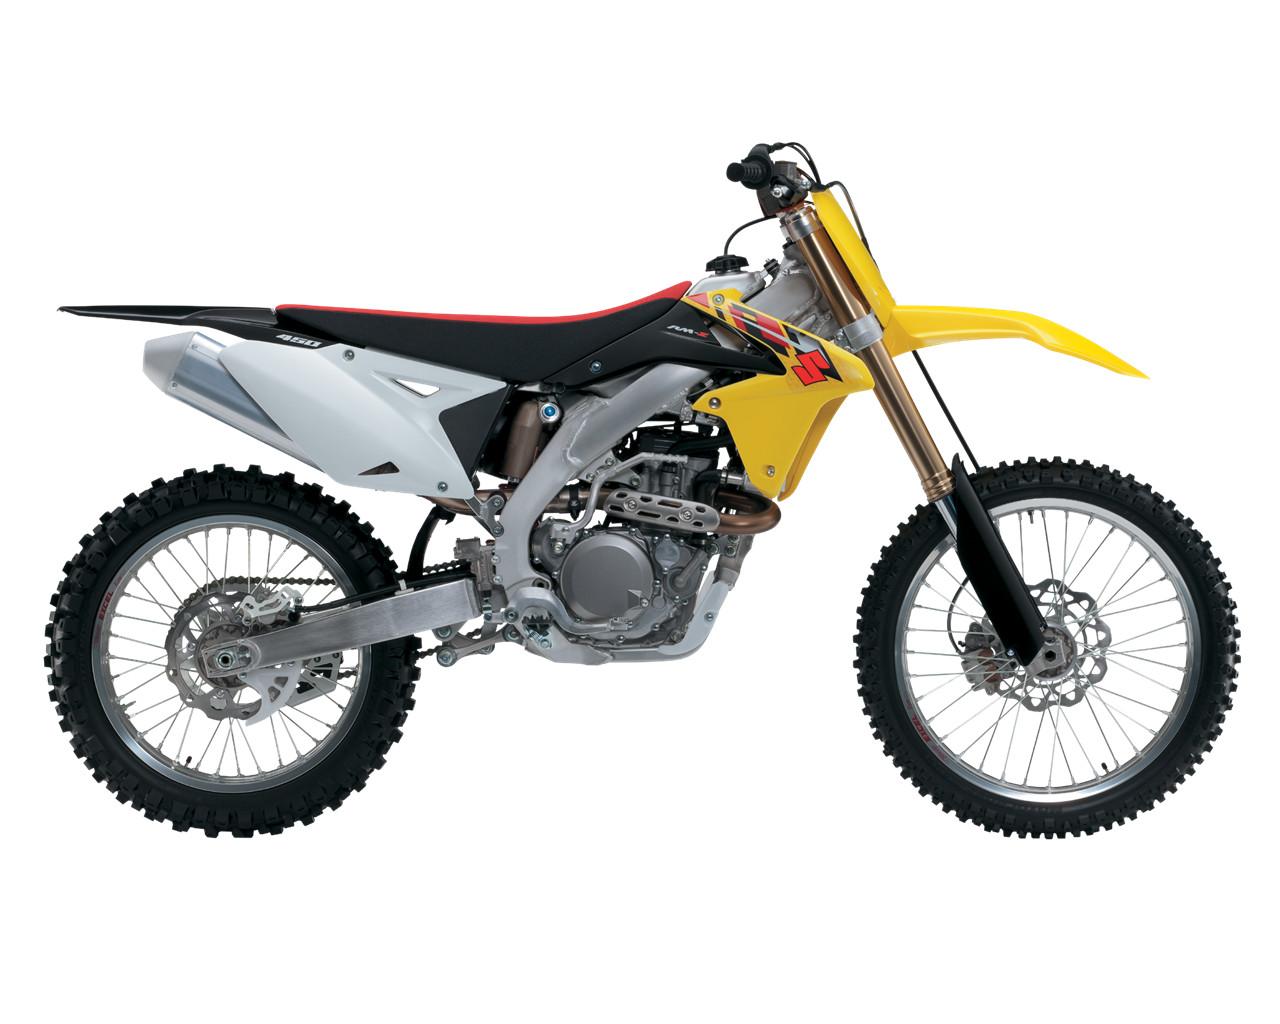 2013 Suzuki RM-Z450 - First Look: 2013 Suzuki RM-Z Models - Motocross Pictures - Vital MX